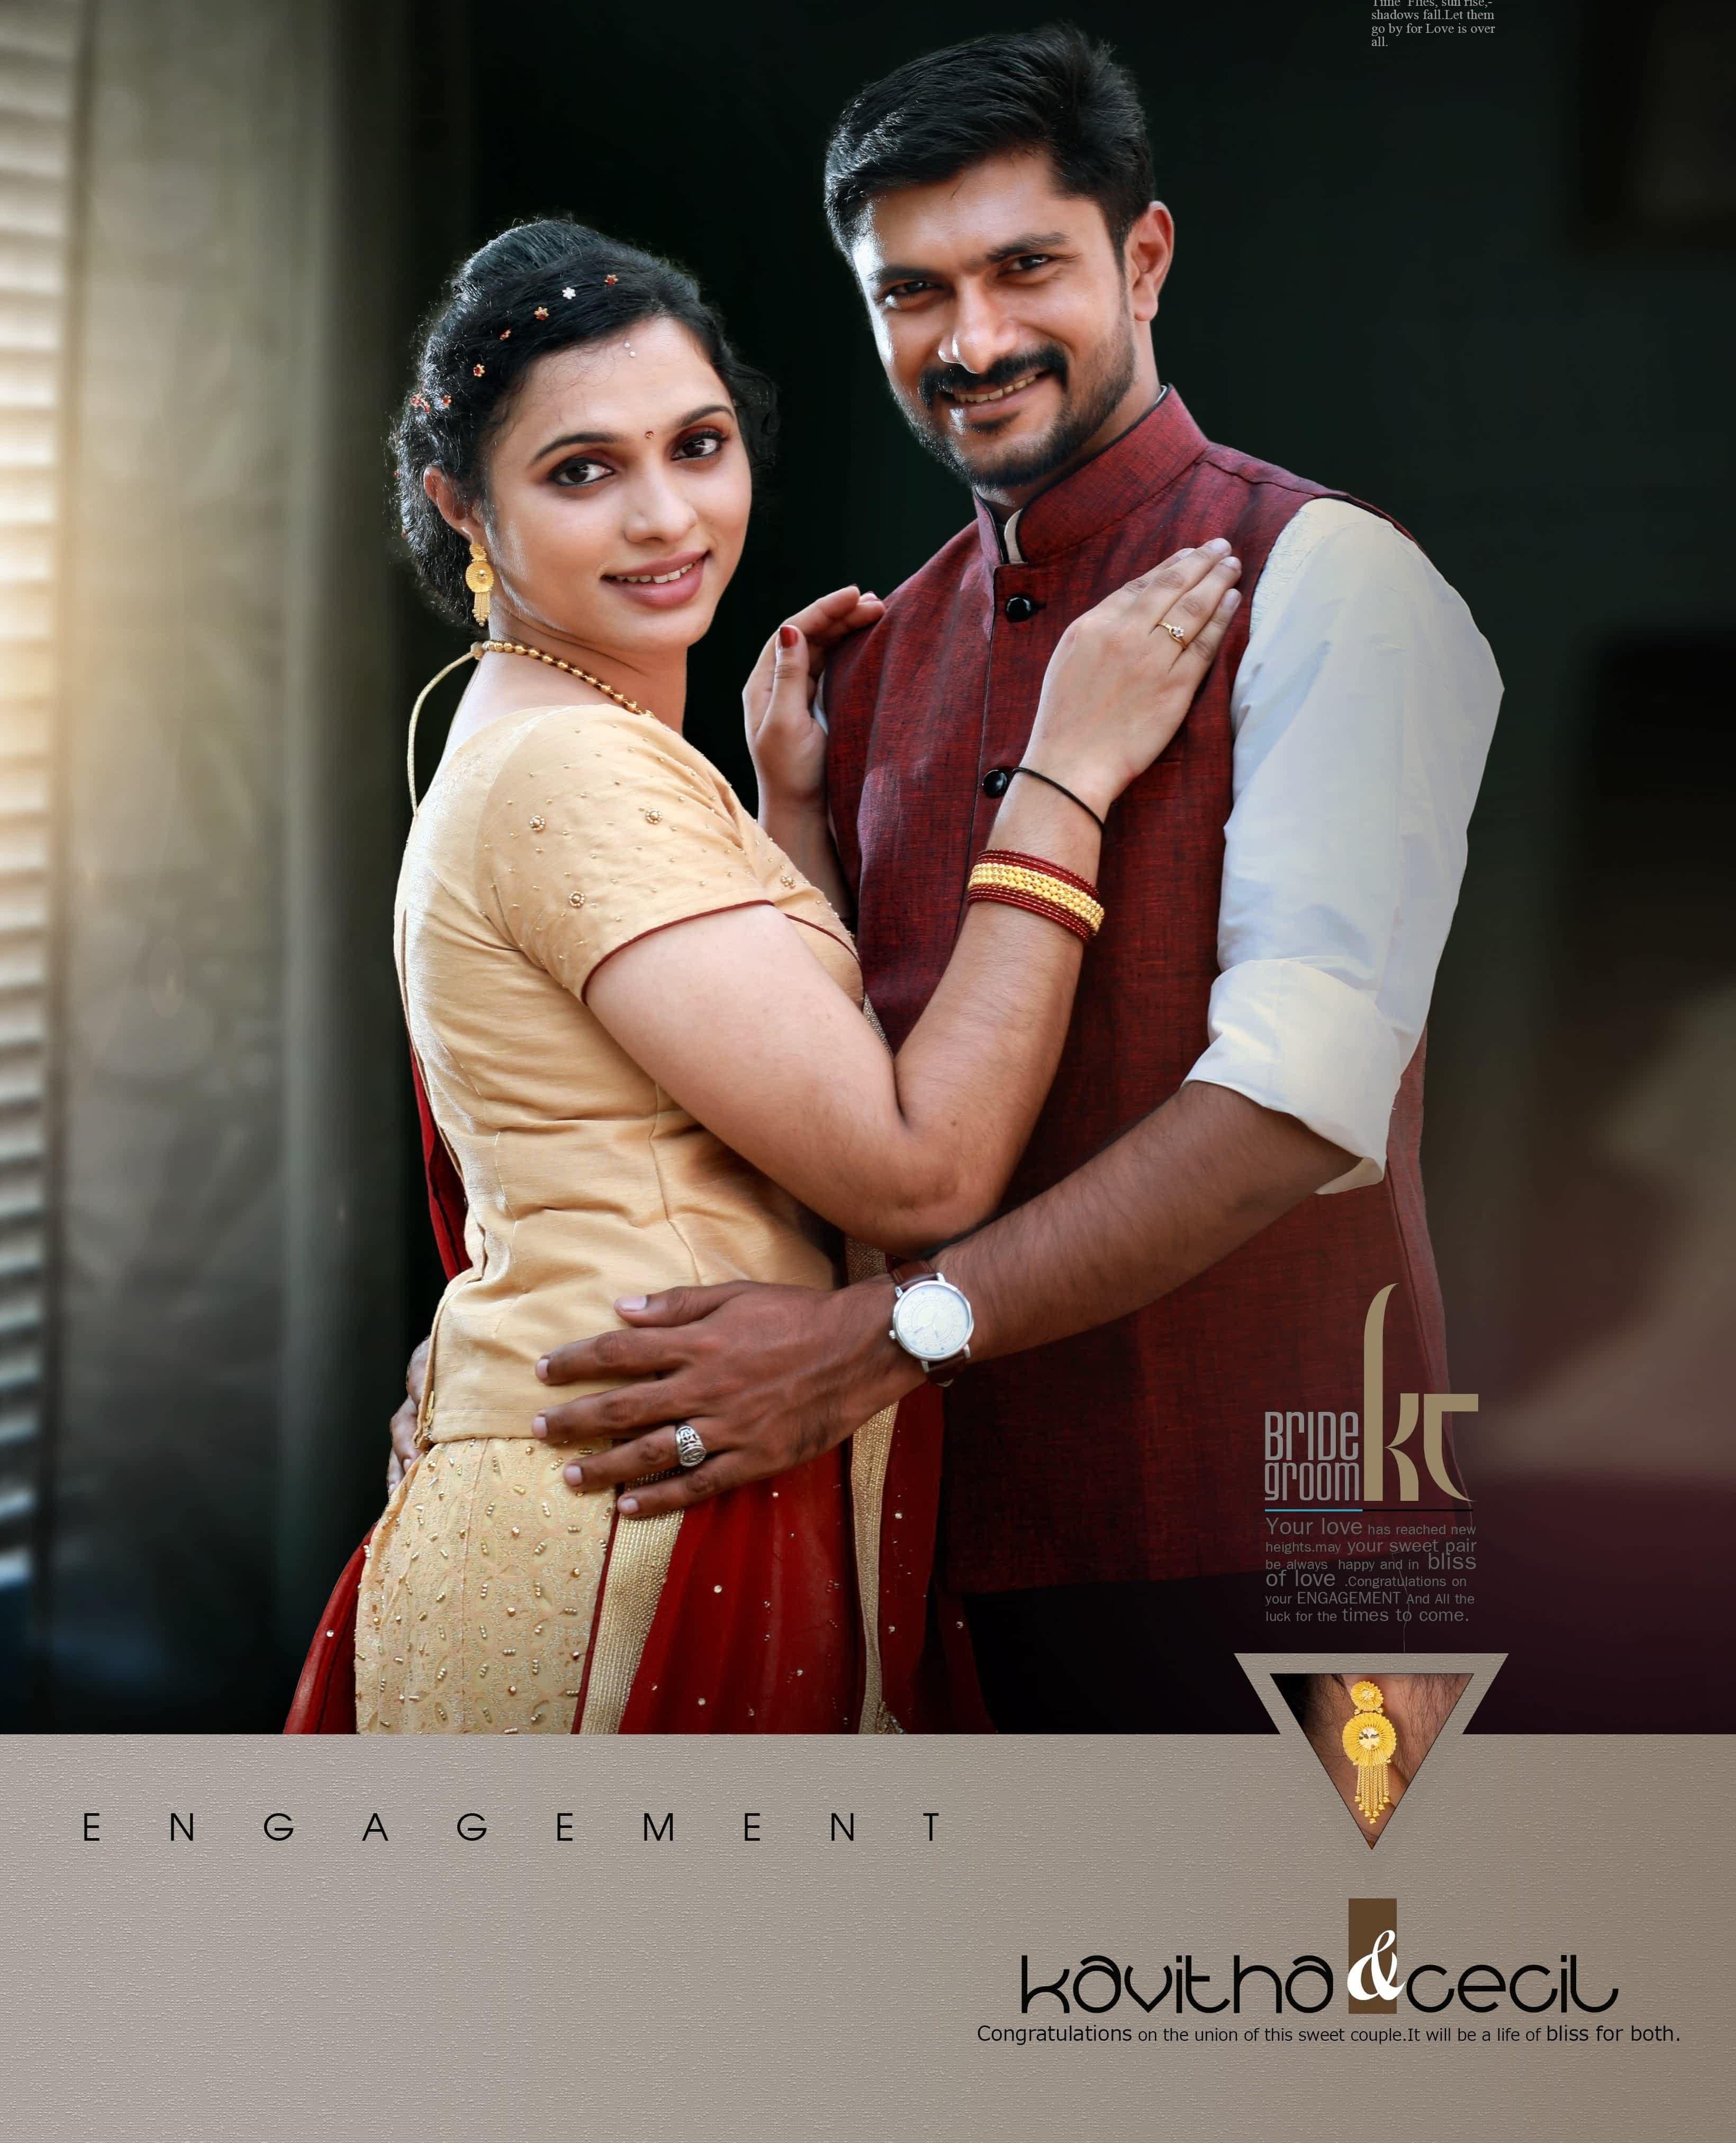 Cecil & Kavitha